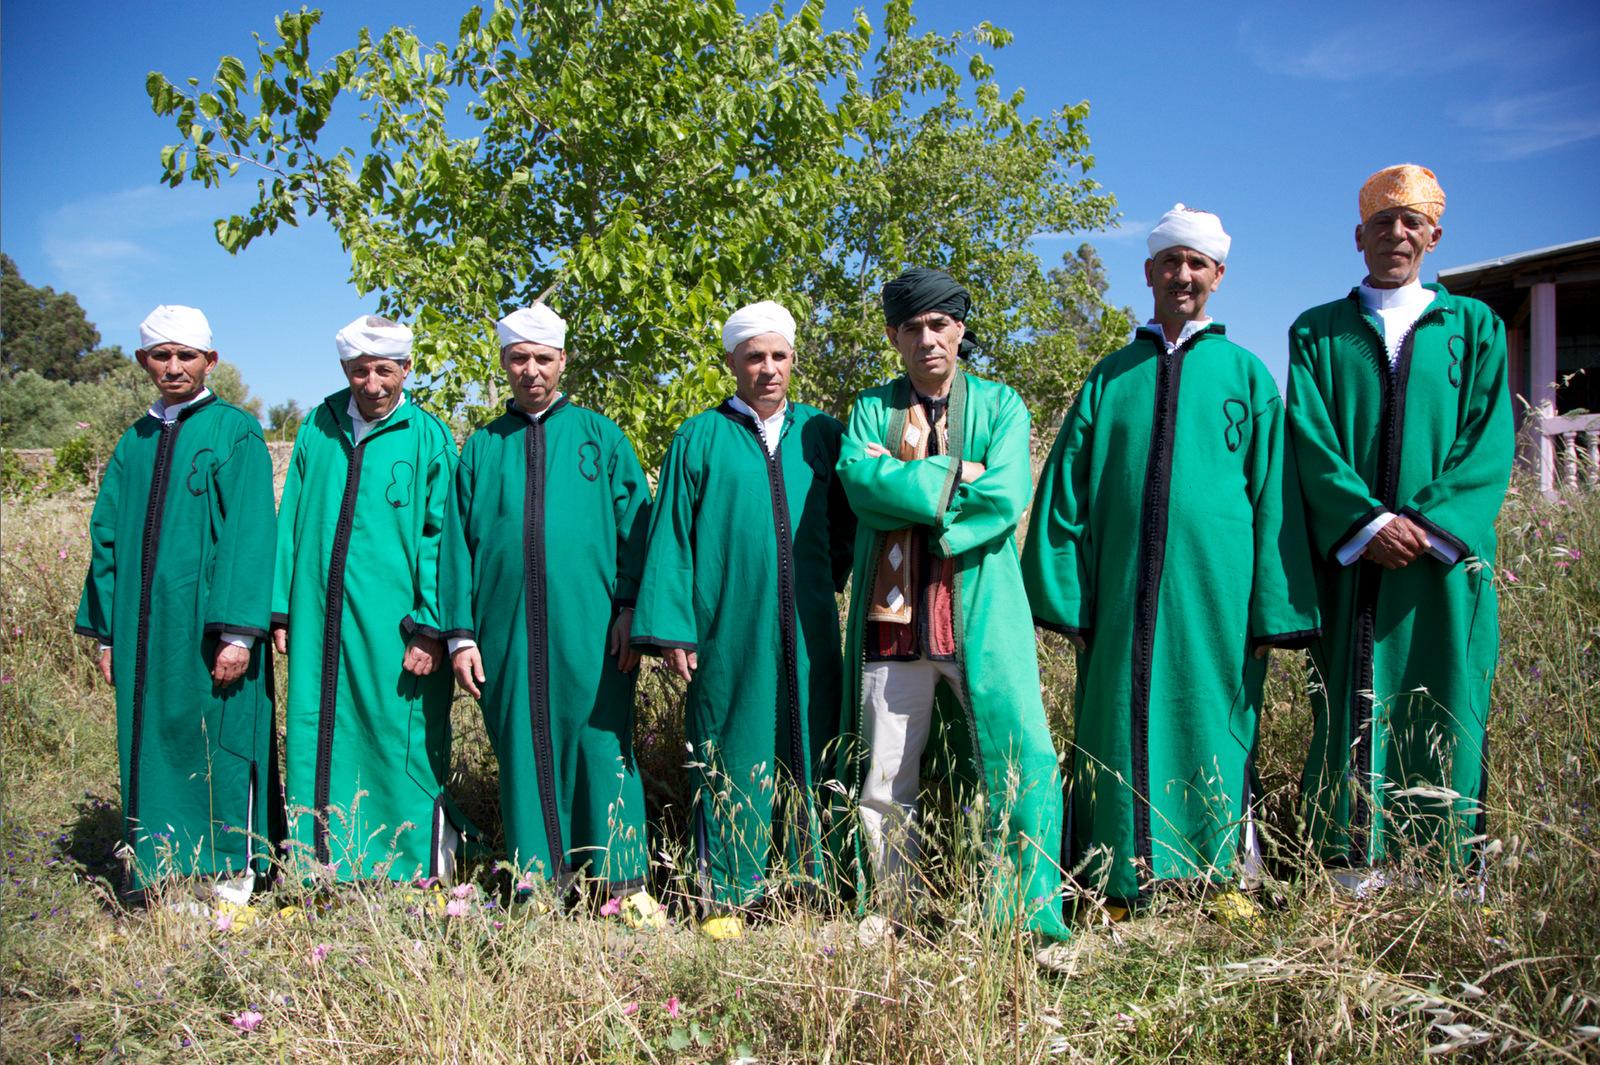 Les Master Musicians of Jajouka © DR